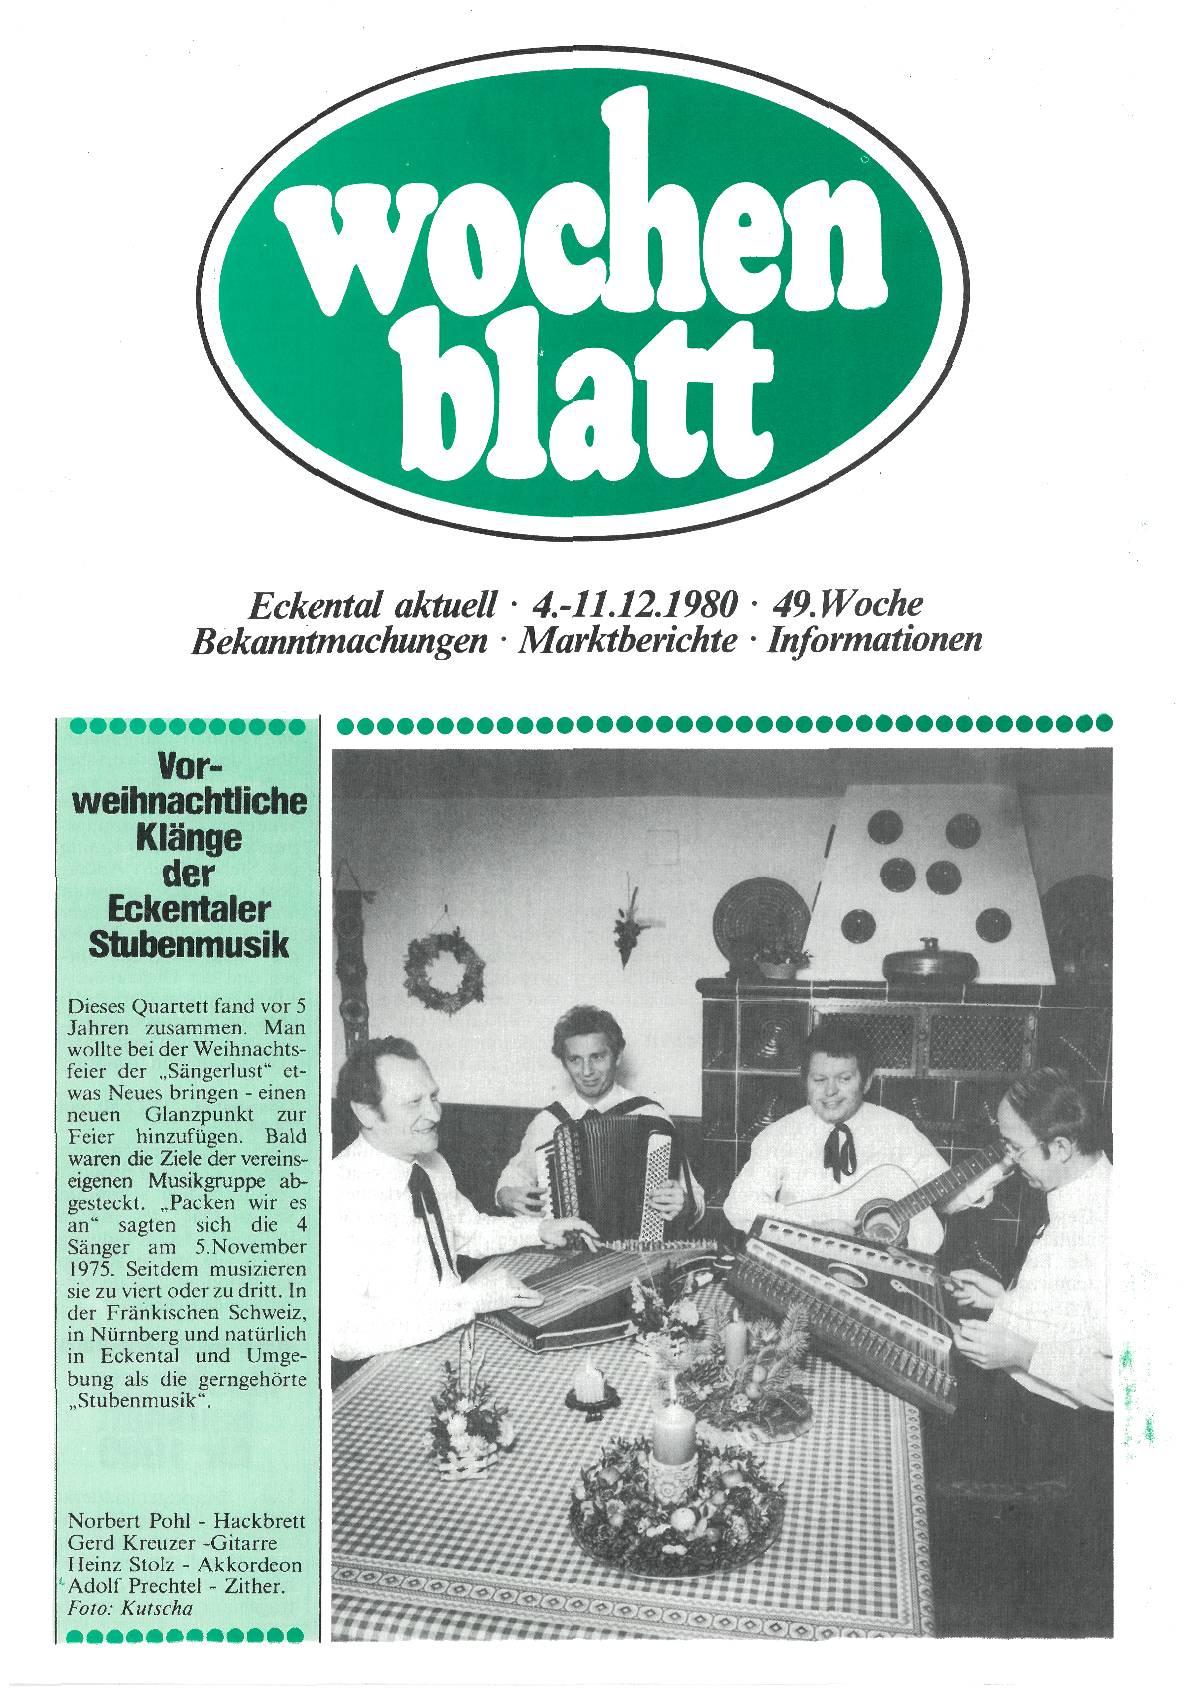 wochenblatt Ausgabe 1980#49